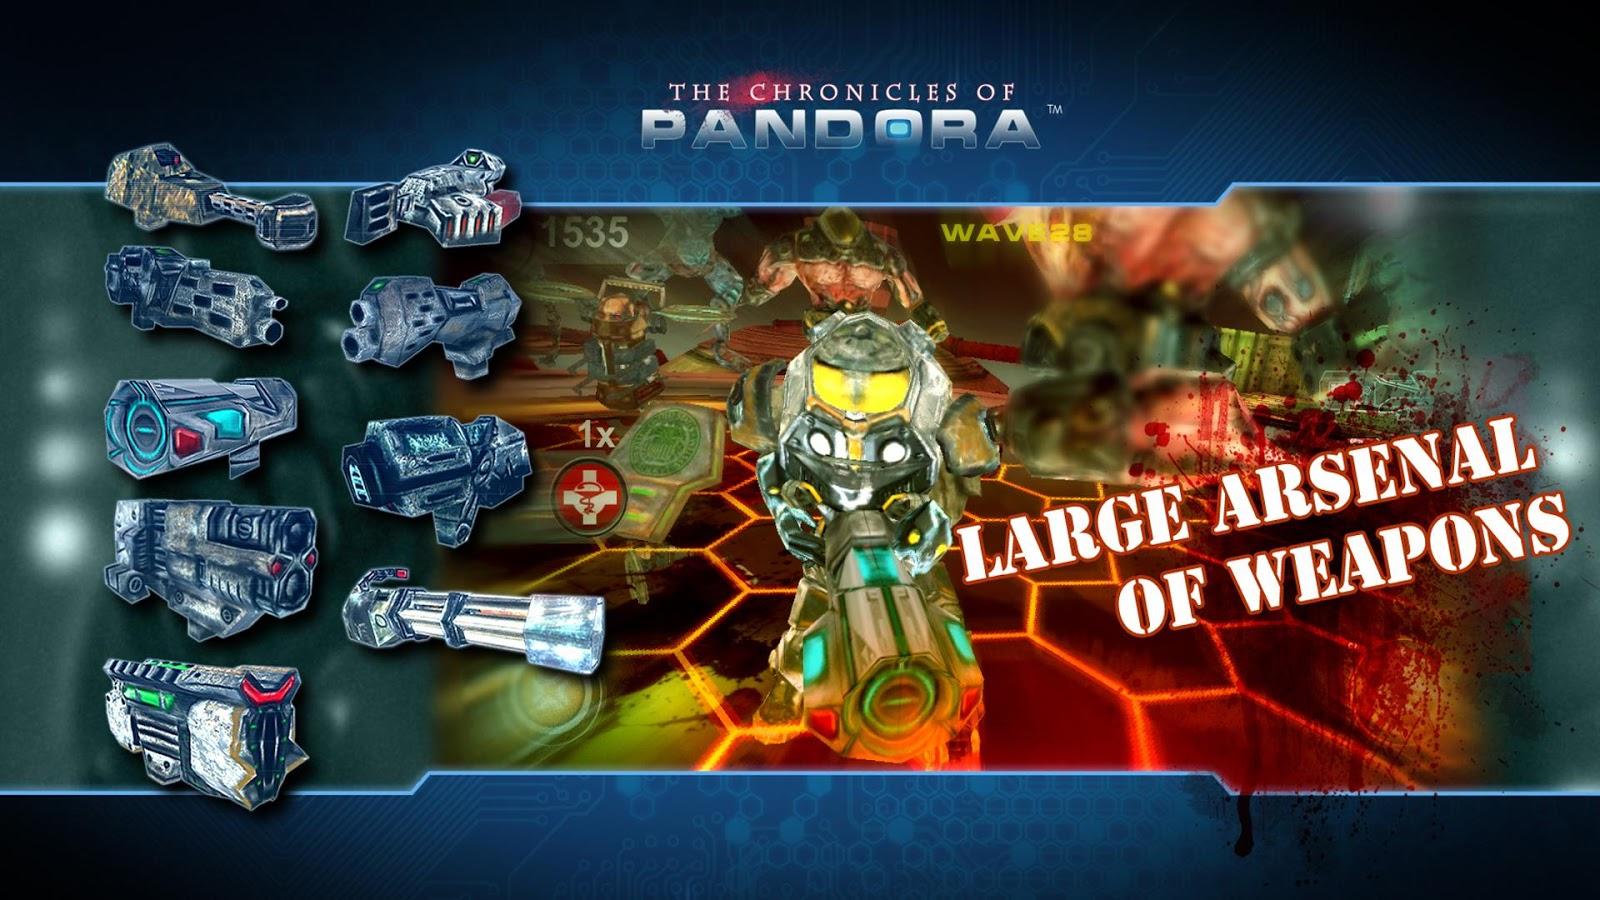 The-Chronicles-of-Pandora 19